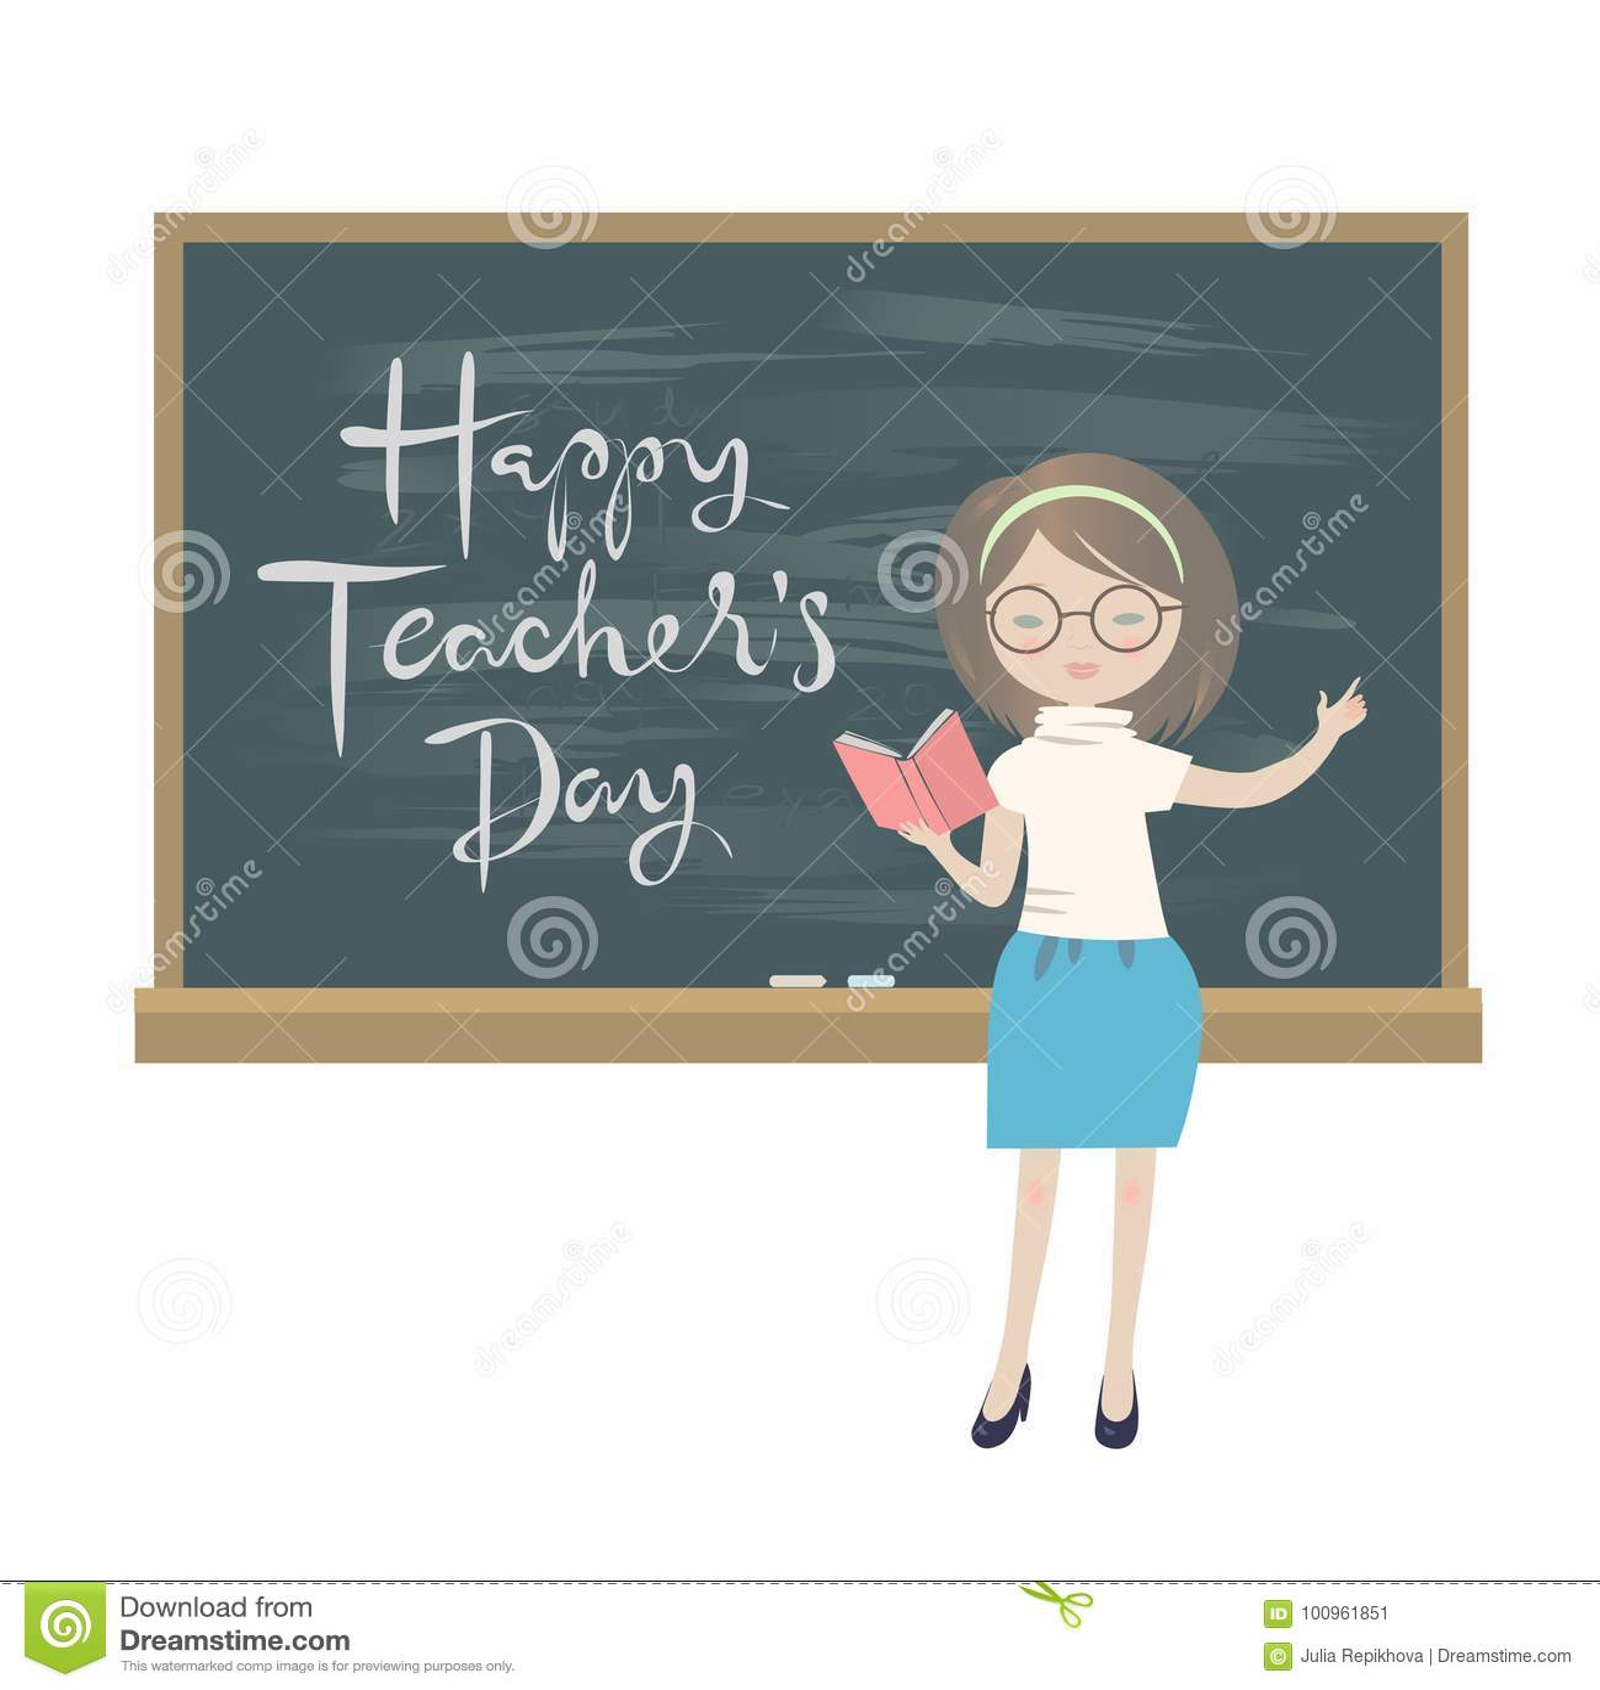 Teachers Day Greeting Card A Teacher Standing At A Chalkboard Stock